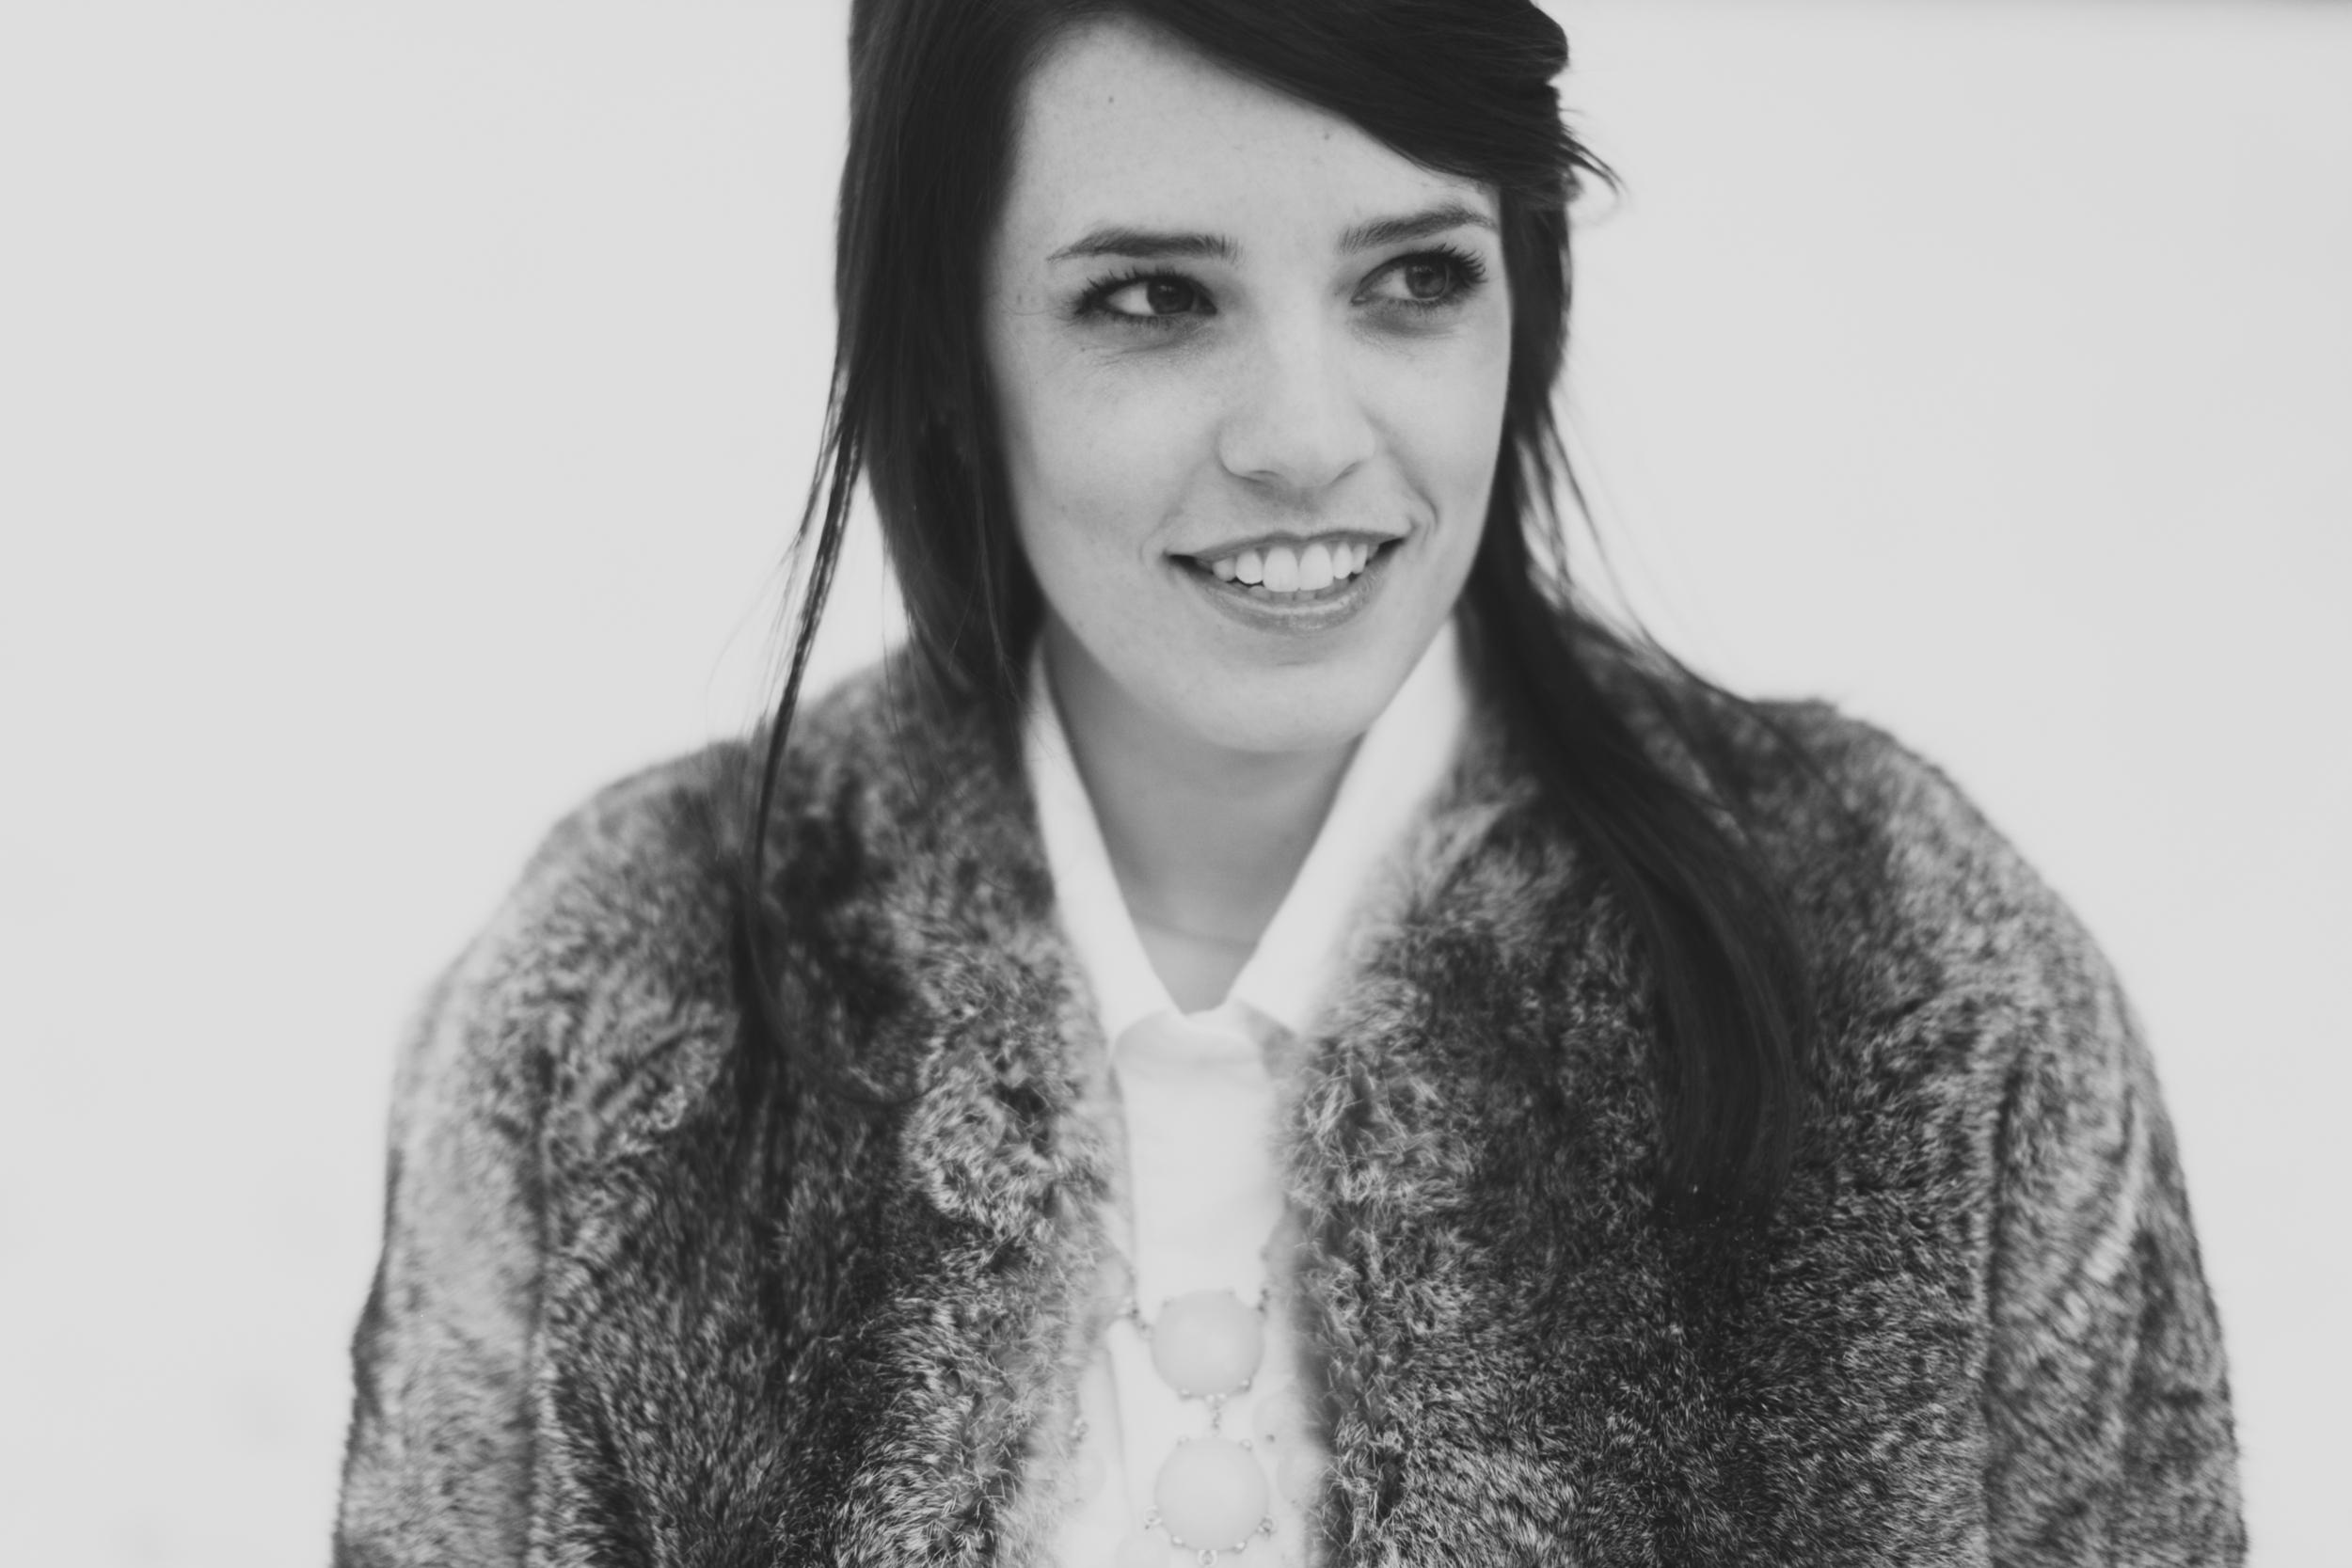 Atlanta-Fashion-Photographer-Kathryn-McCrary-Photography-Snow-Snowlanta-Fur-Coat-39.jpg